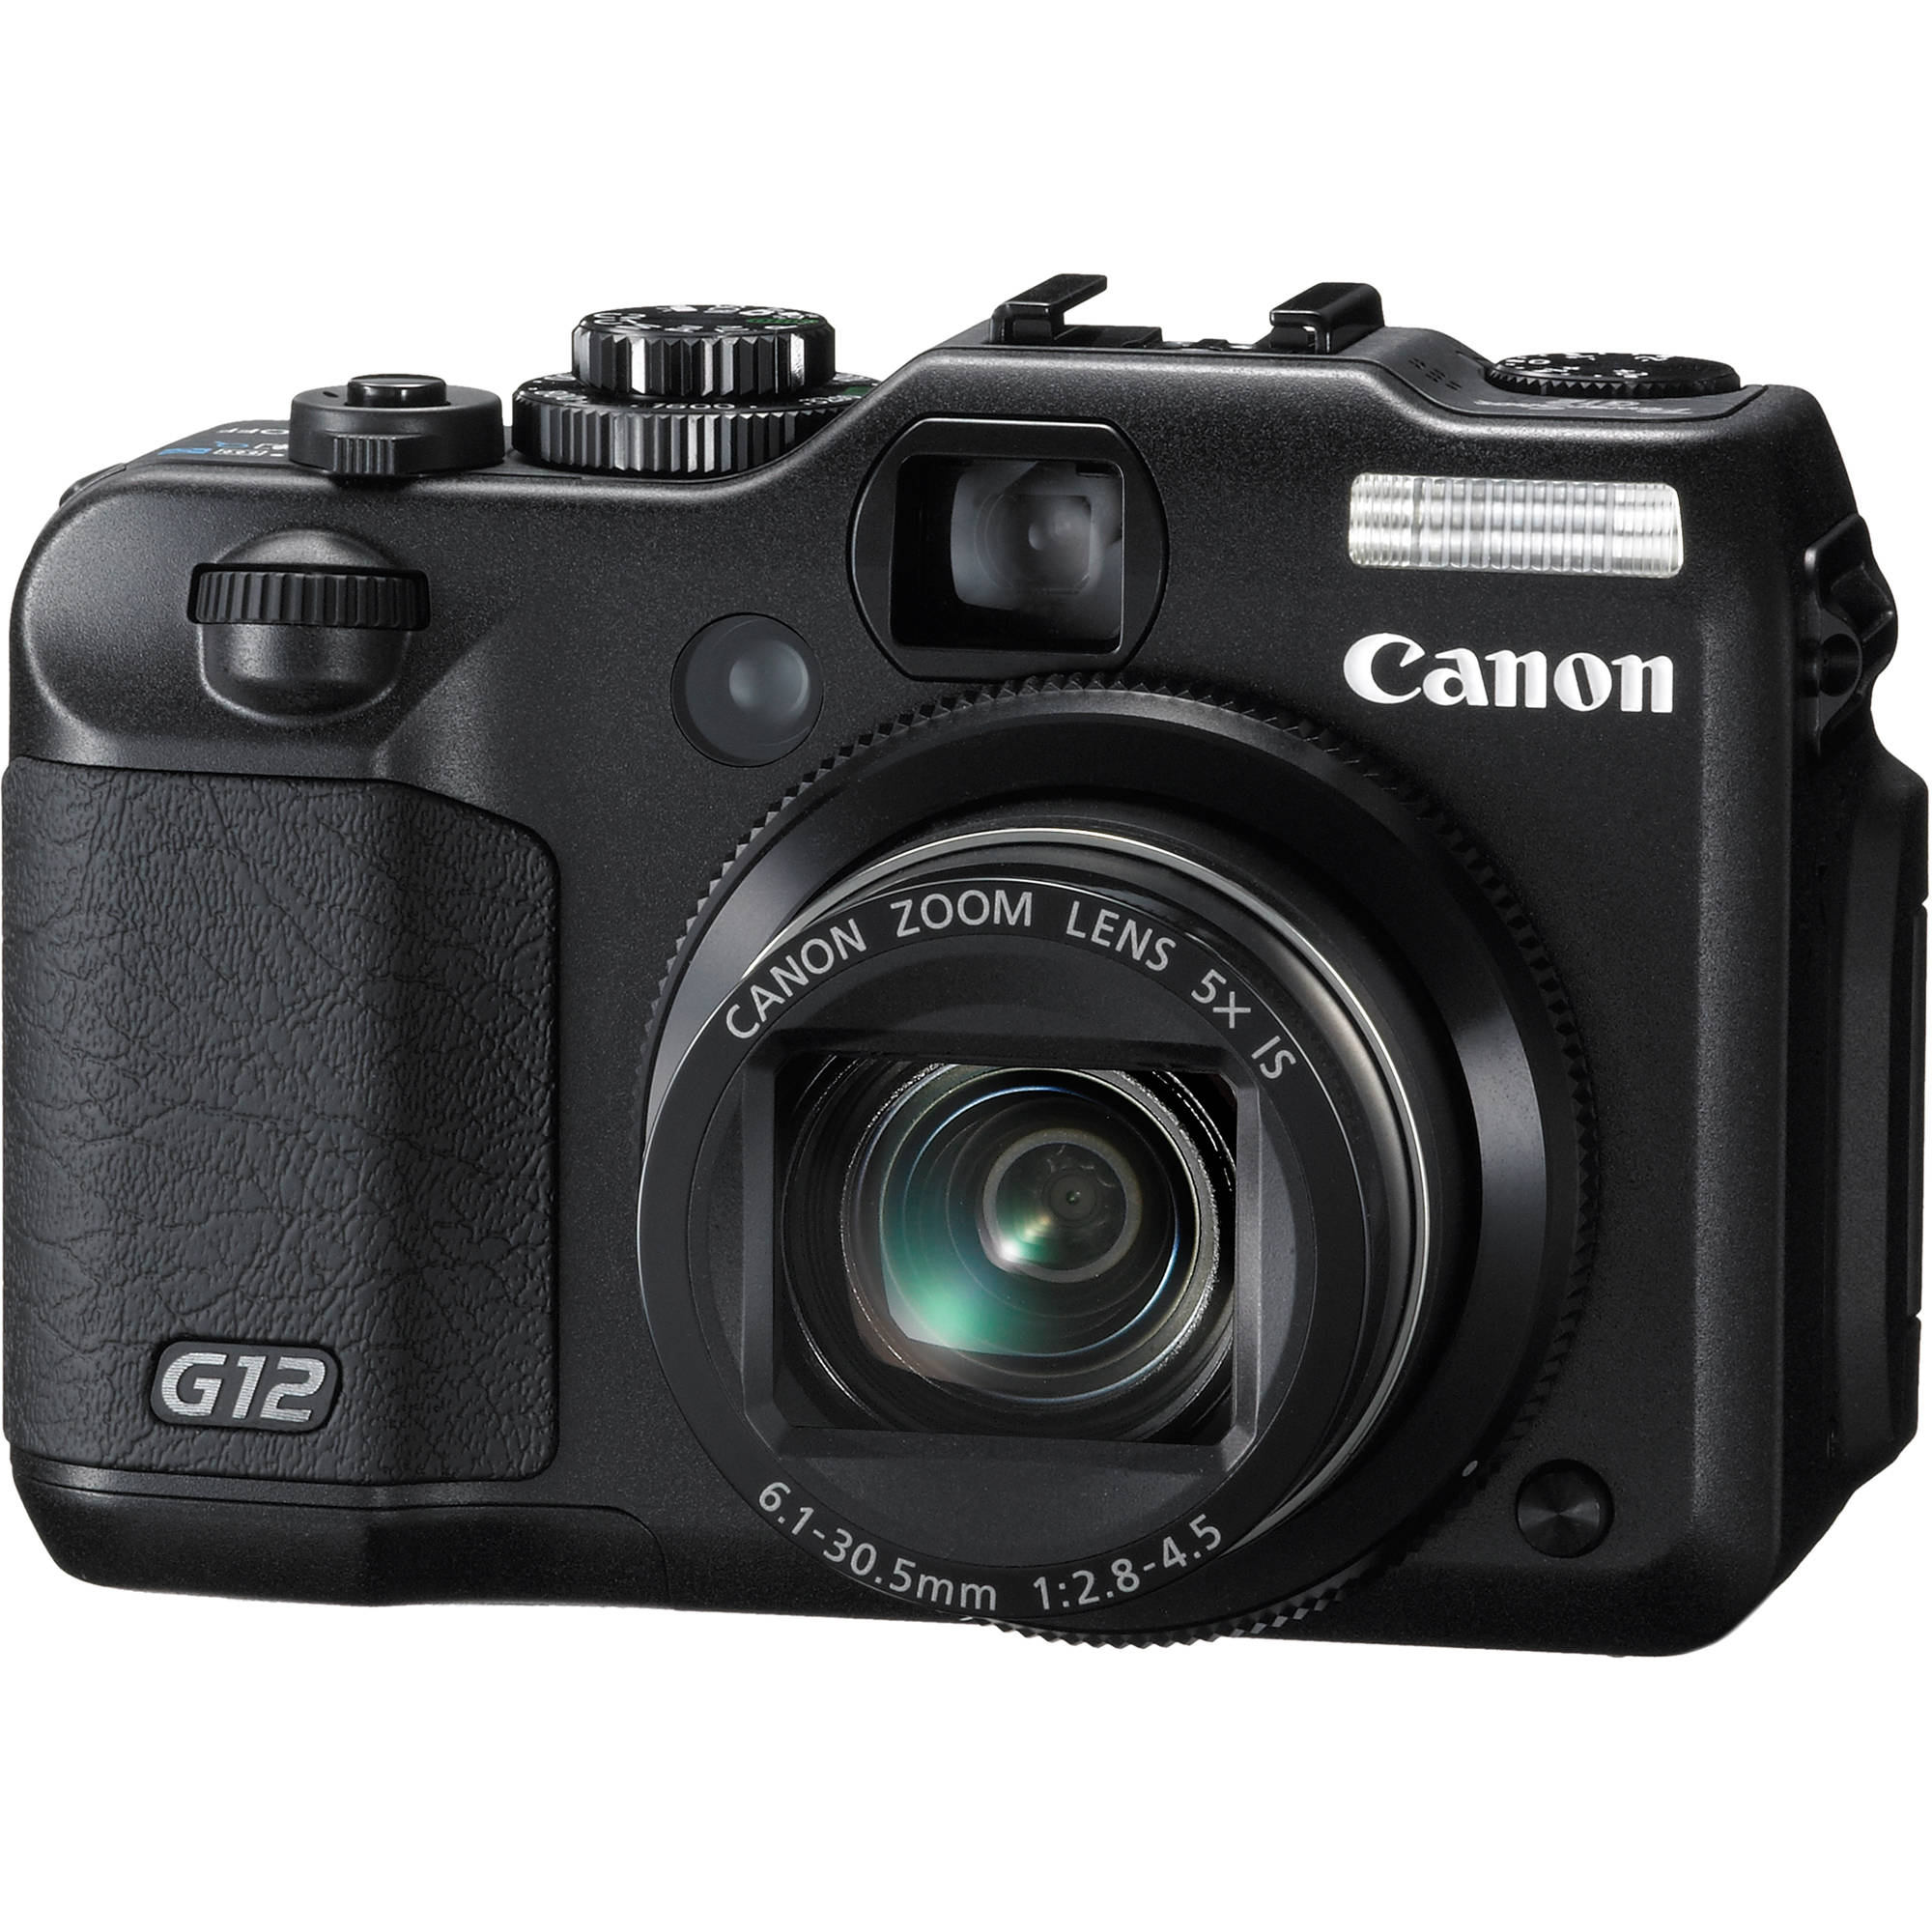 used canon powershot g12 digital camera 4342b026aa b h photo rh bhphotovideo com Canon PowerShot G12 Sale Canon PowerShot G12 Body